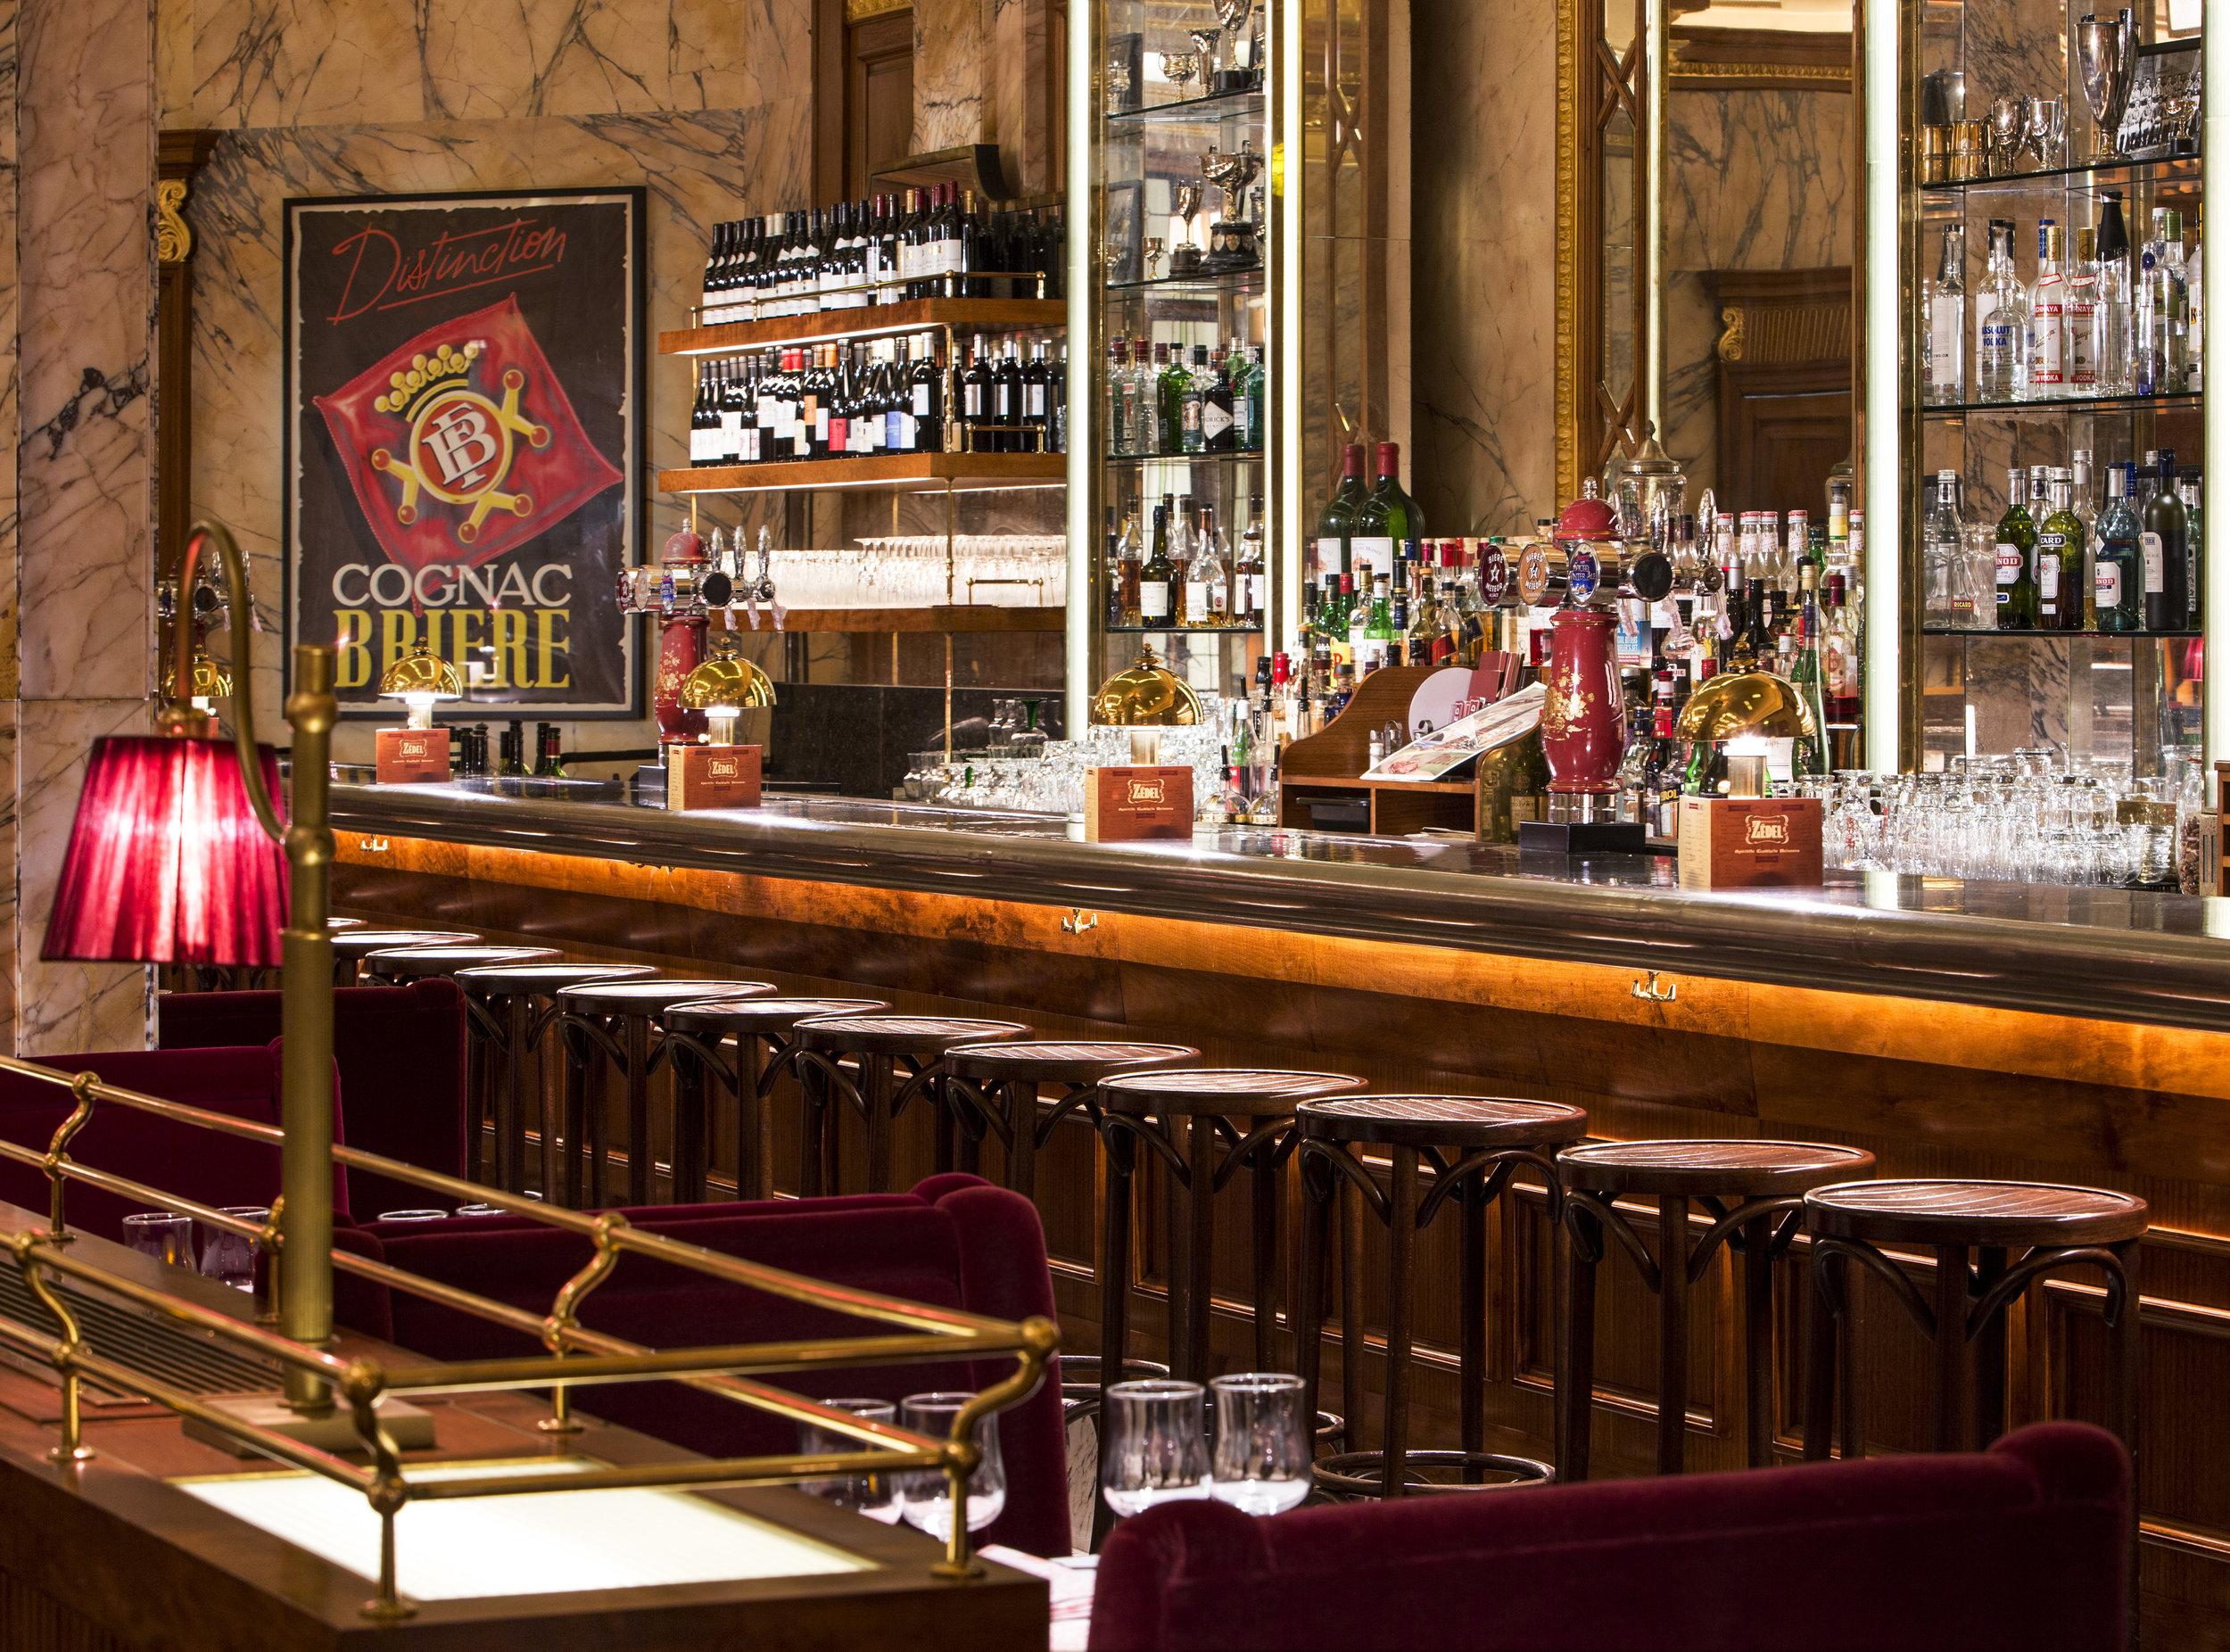 Brasserie Zedel_interior_1.jpg